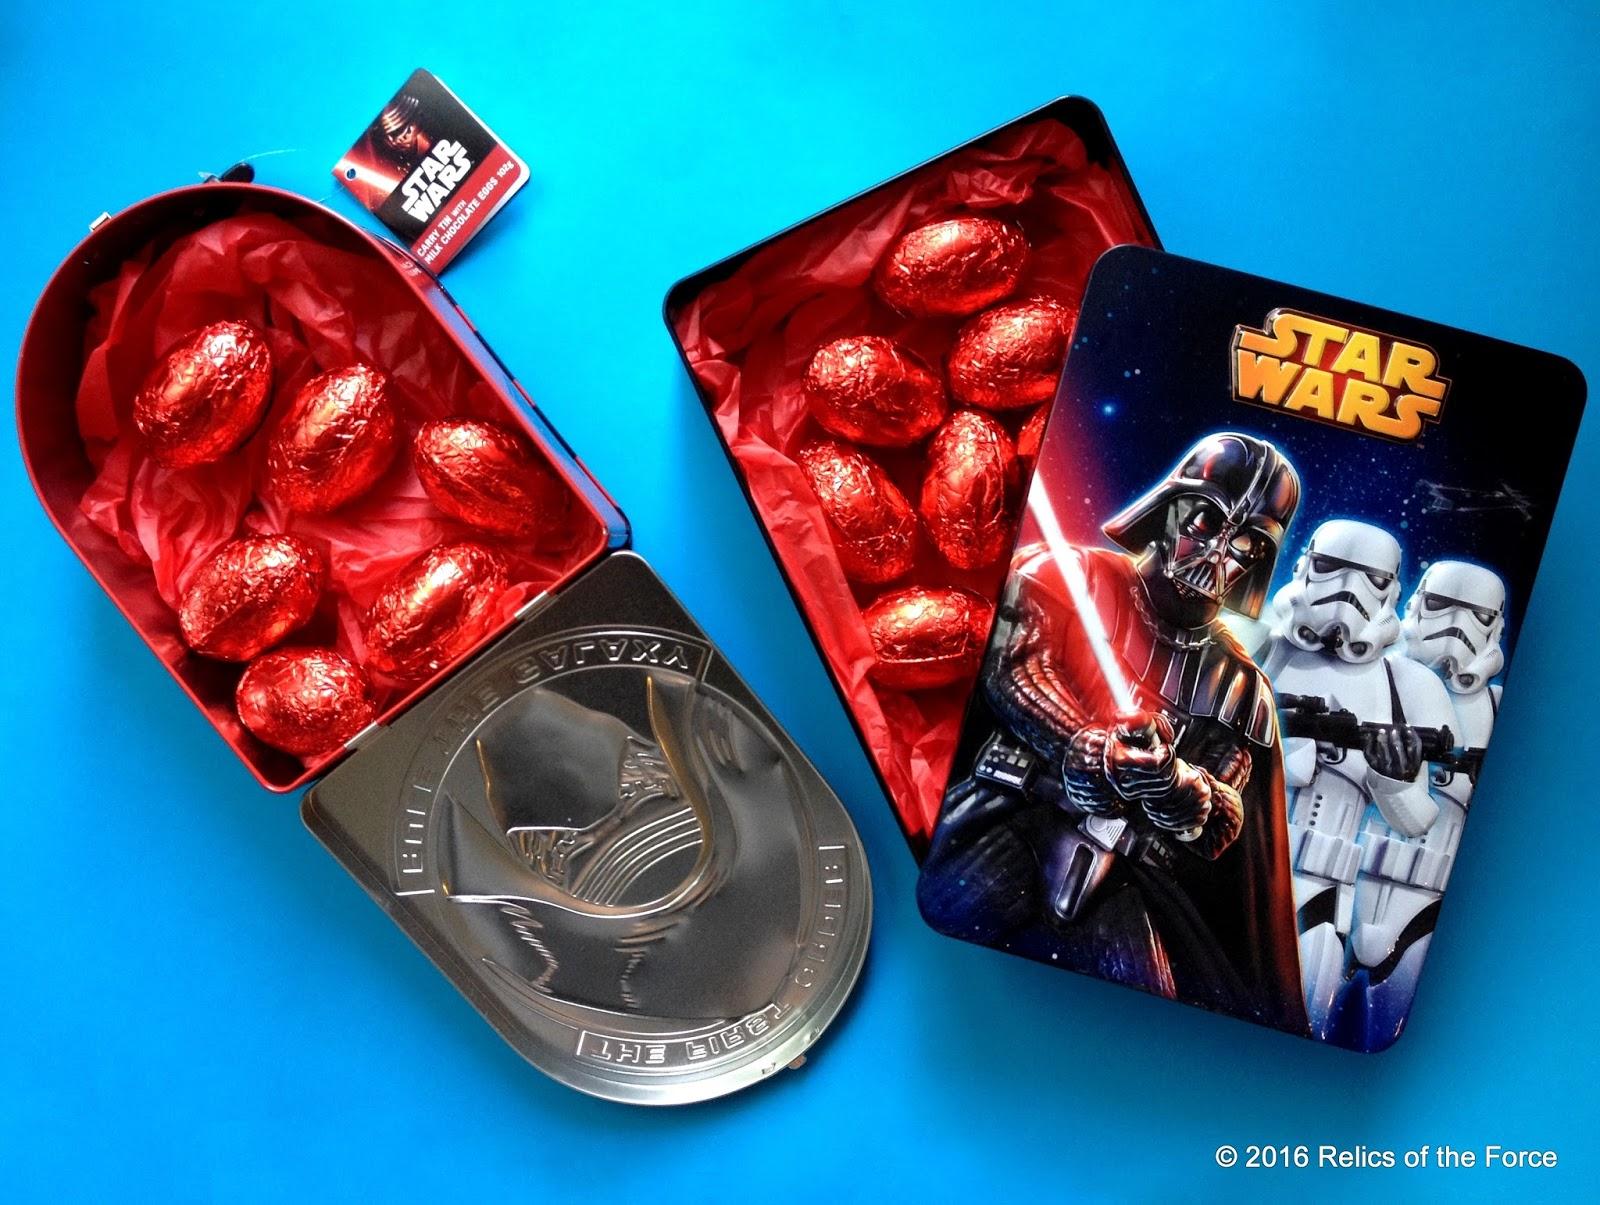 Star Wars Stormtrooper Milk Chocolate Tins